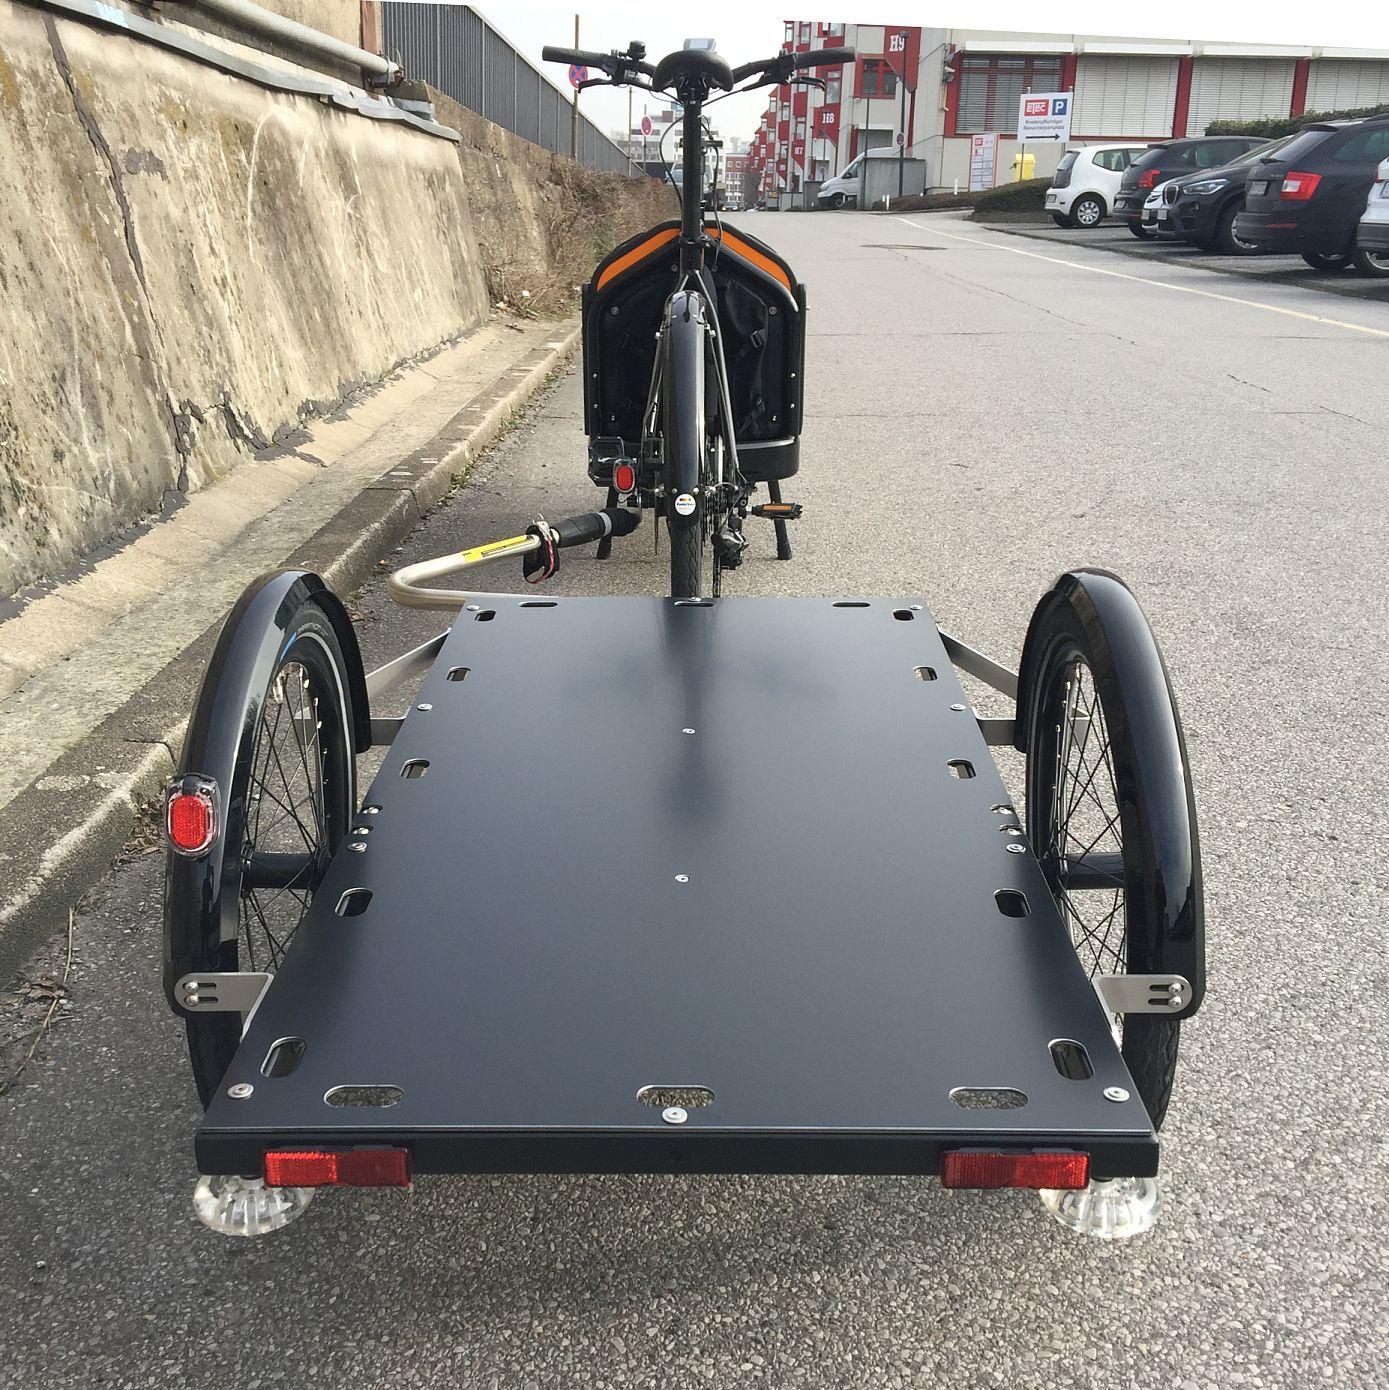 Convoy Biketrailer in 2020 | Anhänger fahrrad, Fahrradhänger